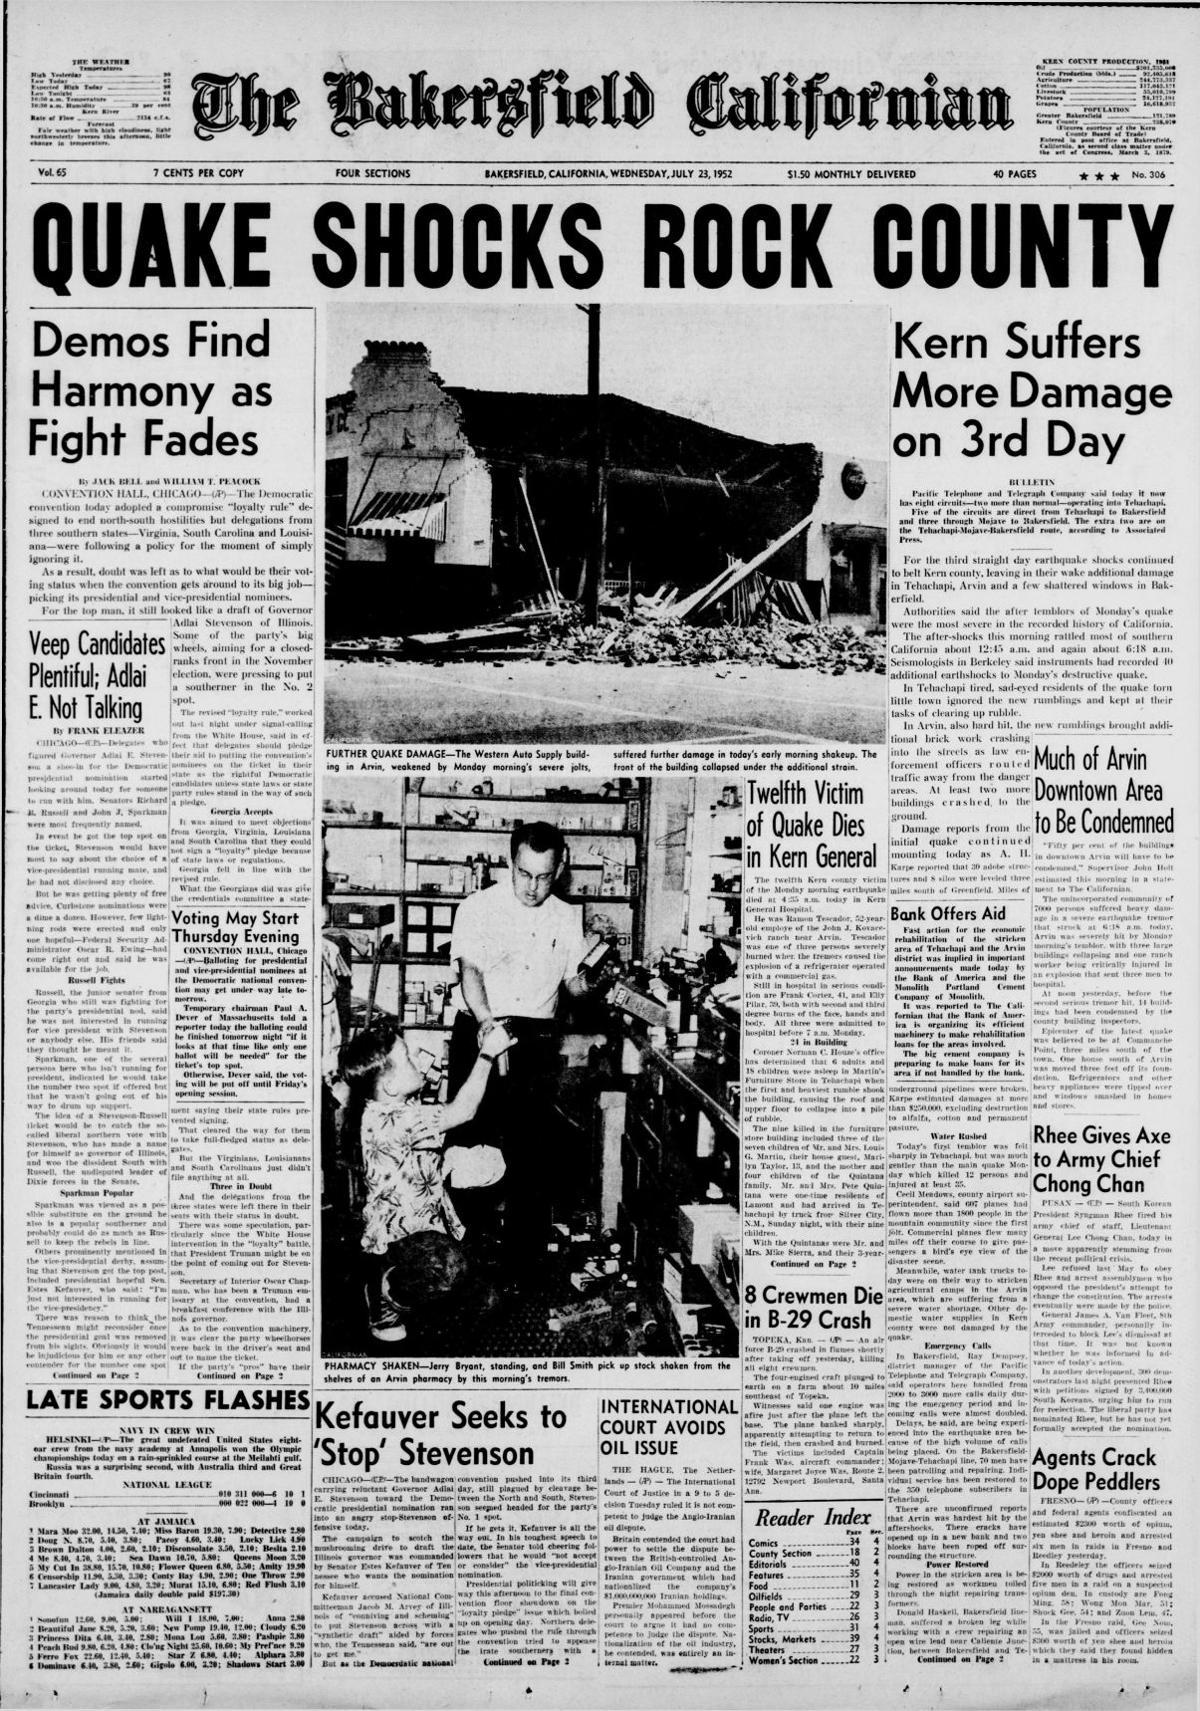 TBC front page: Quake Shocks Rock County